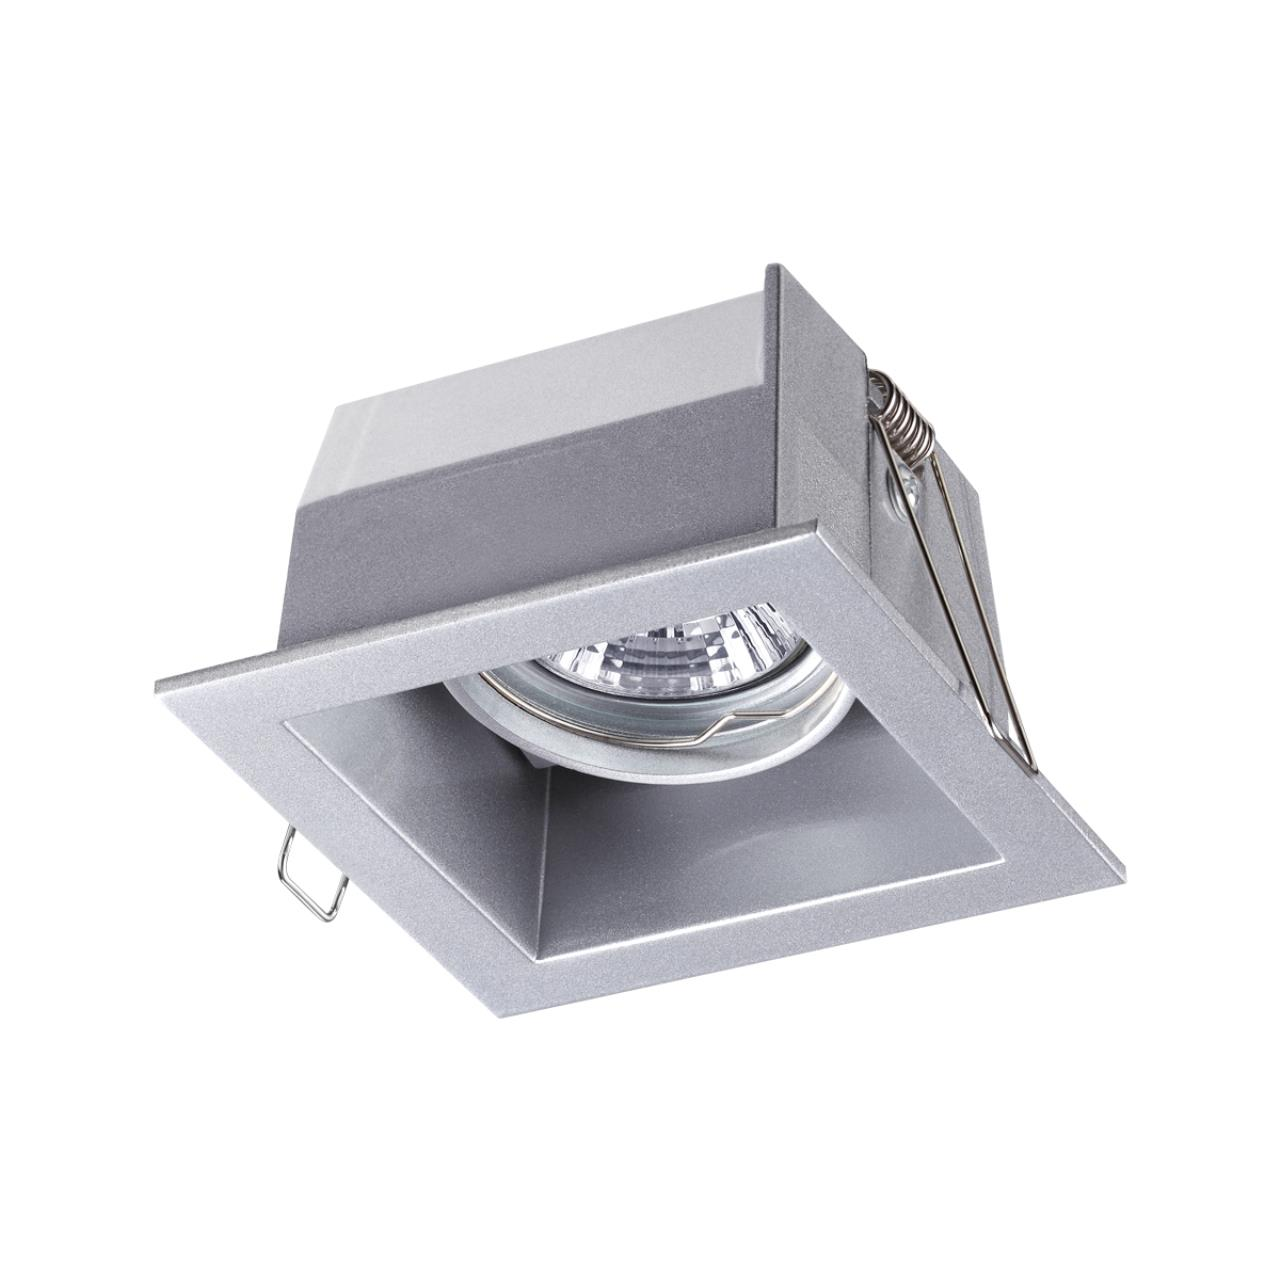 369639 SPOT NT12 131 алюминий Встраиваемый ПВ светильник IP20 GX5.3 50W 12V BELL